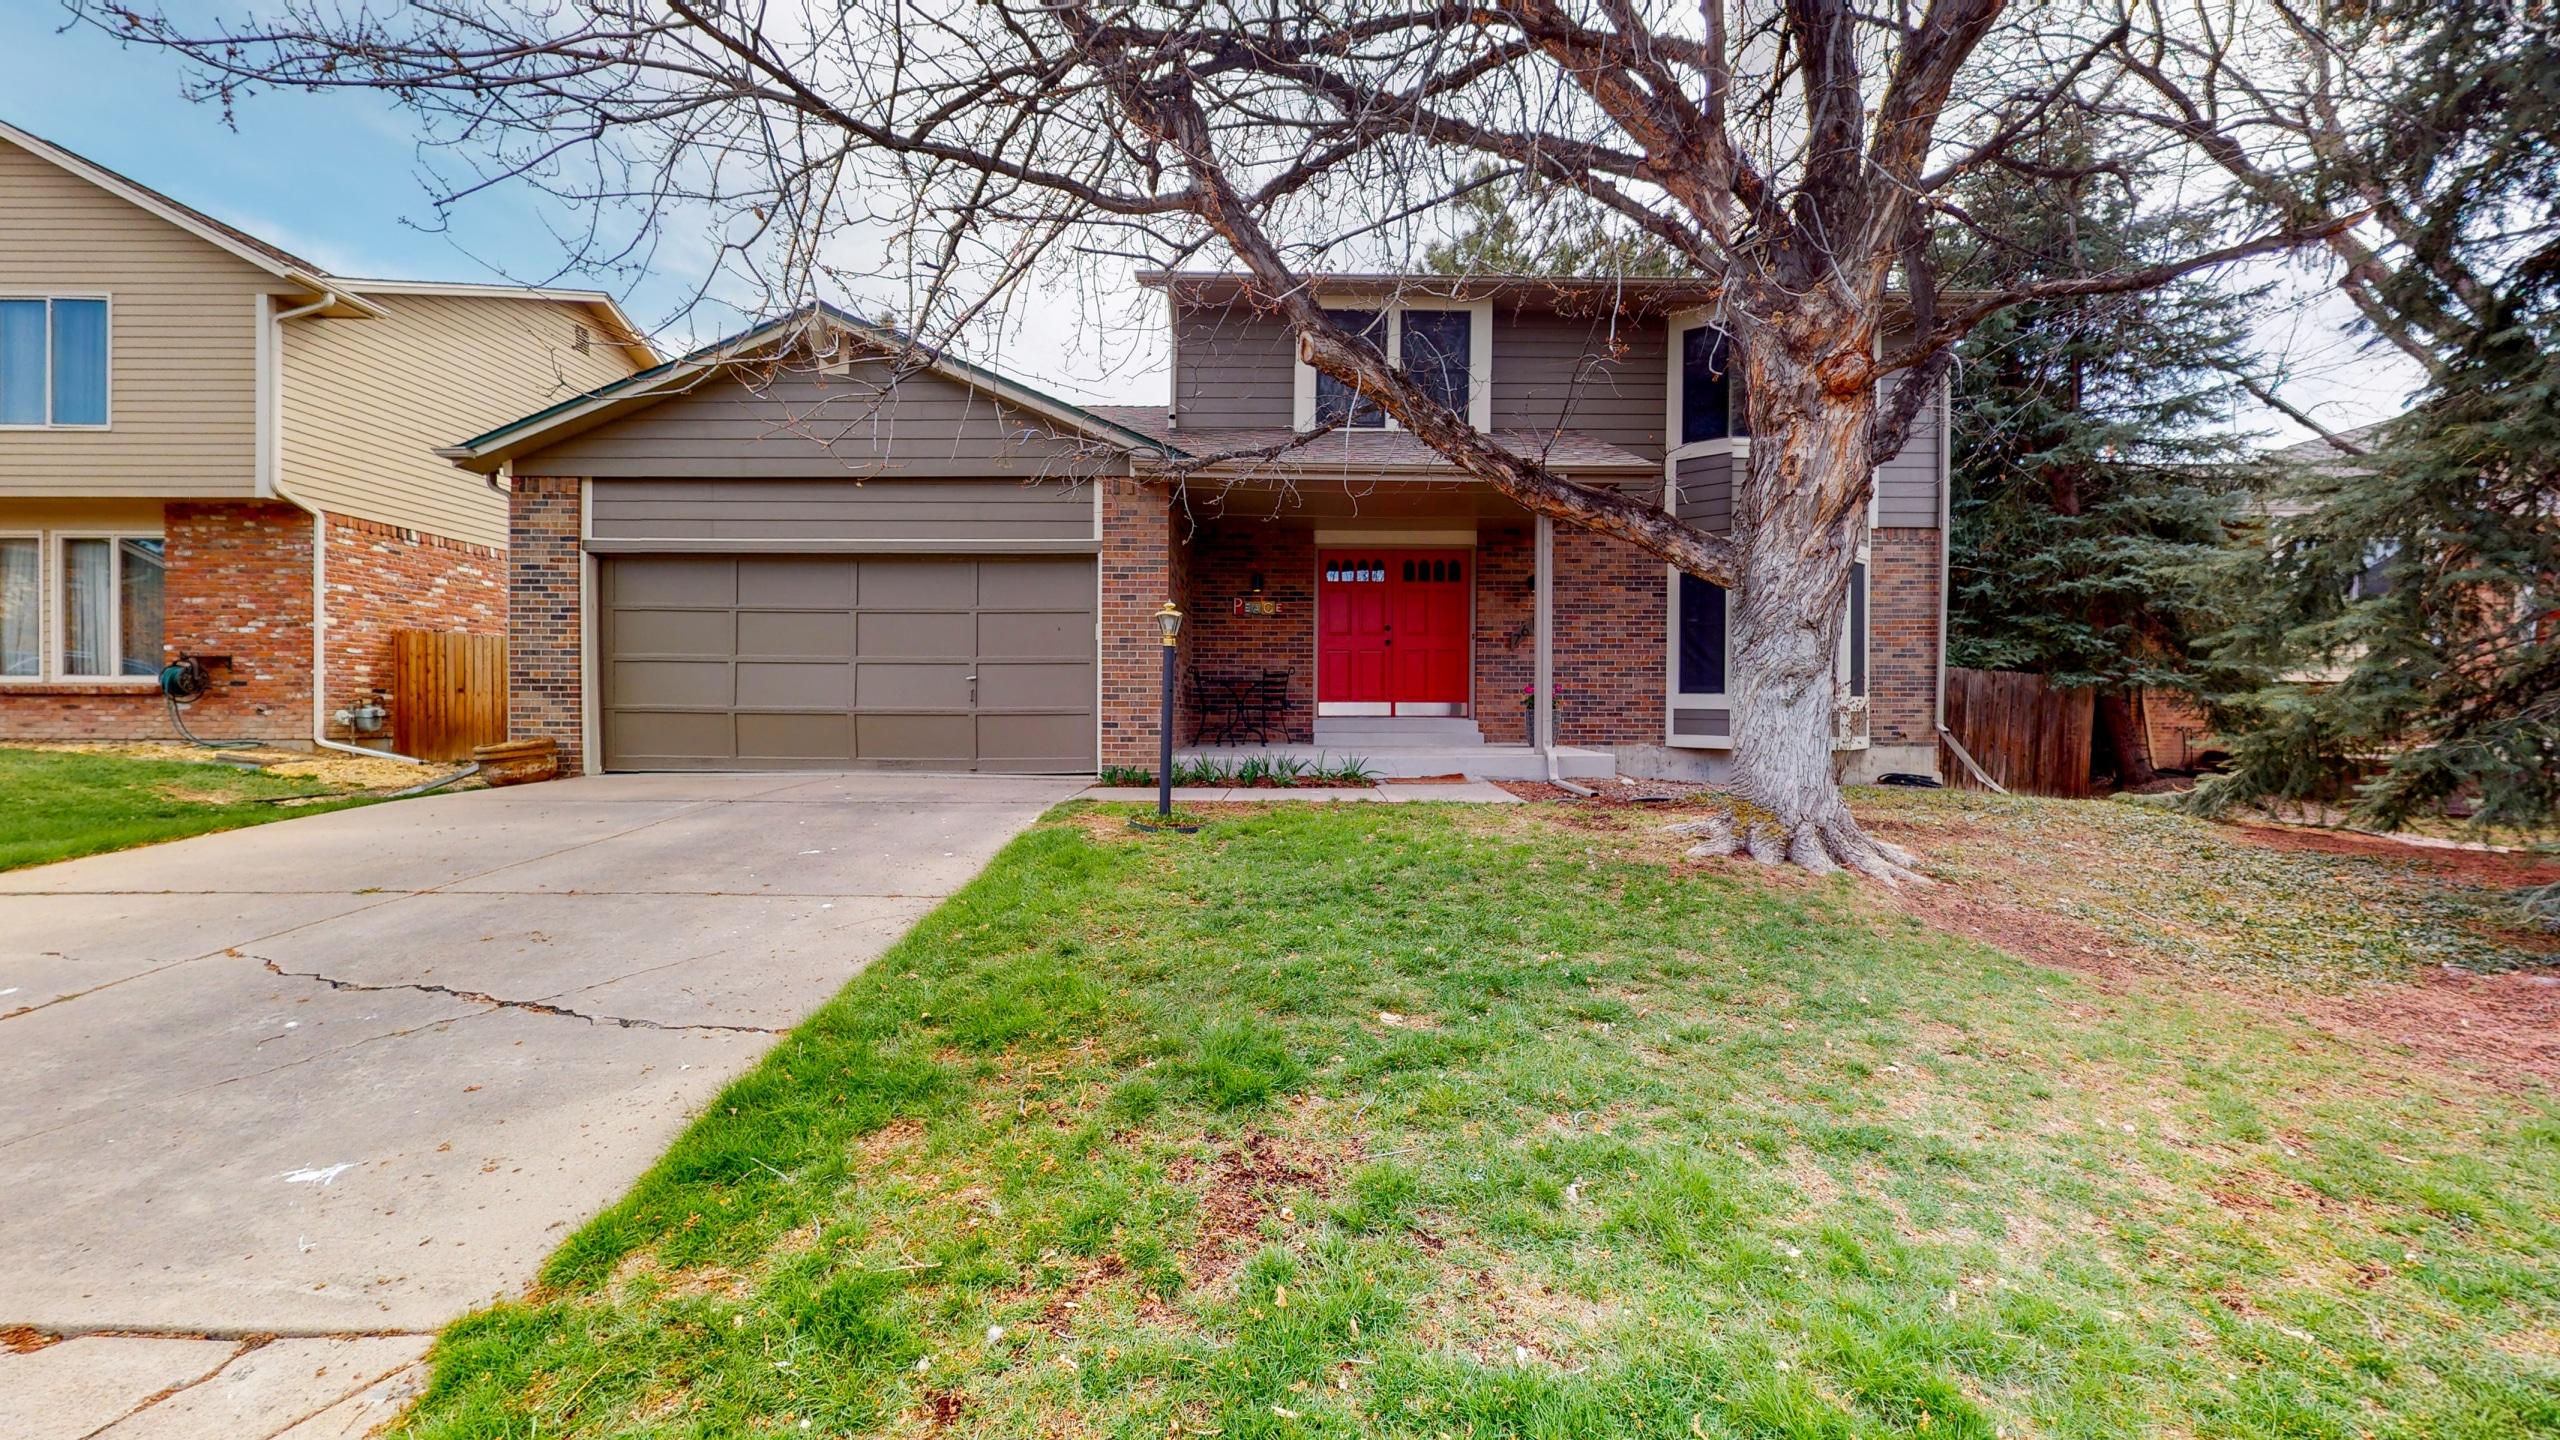 Home for sale in Falcon Ridge Centennial, CO, large single family